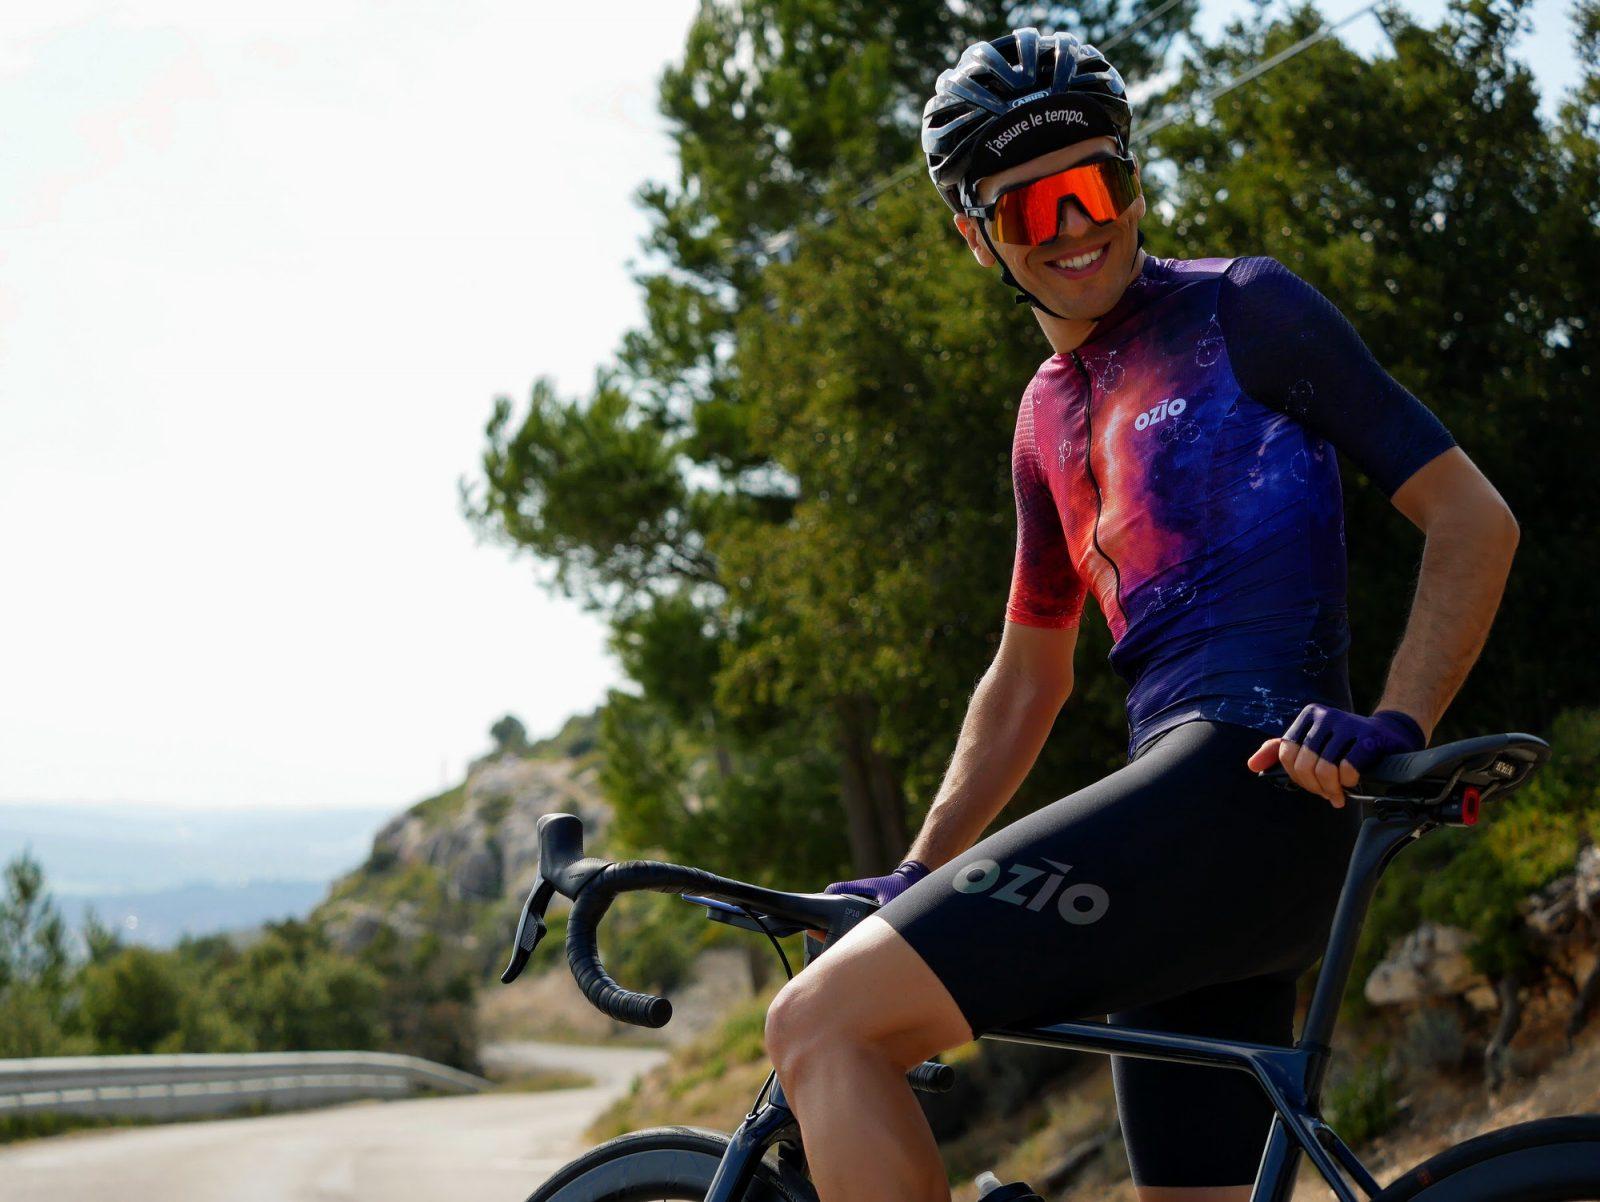 Maillot cycliste été CONSTELLATION